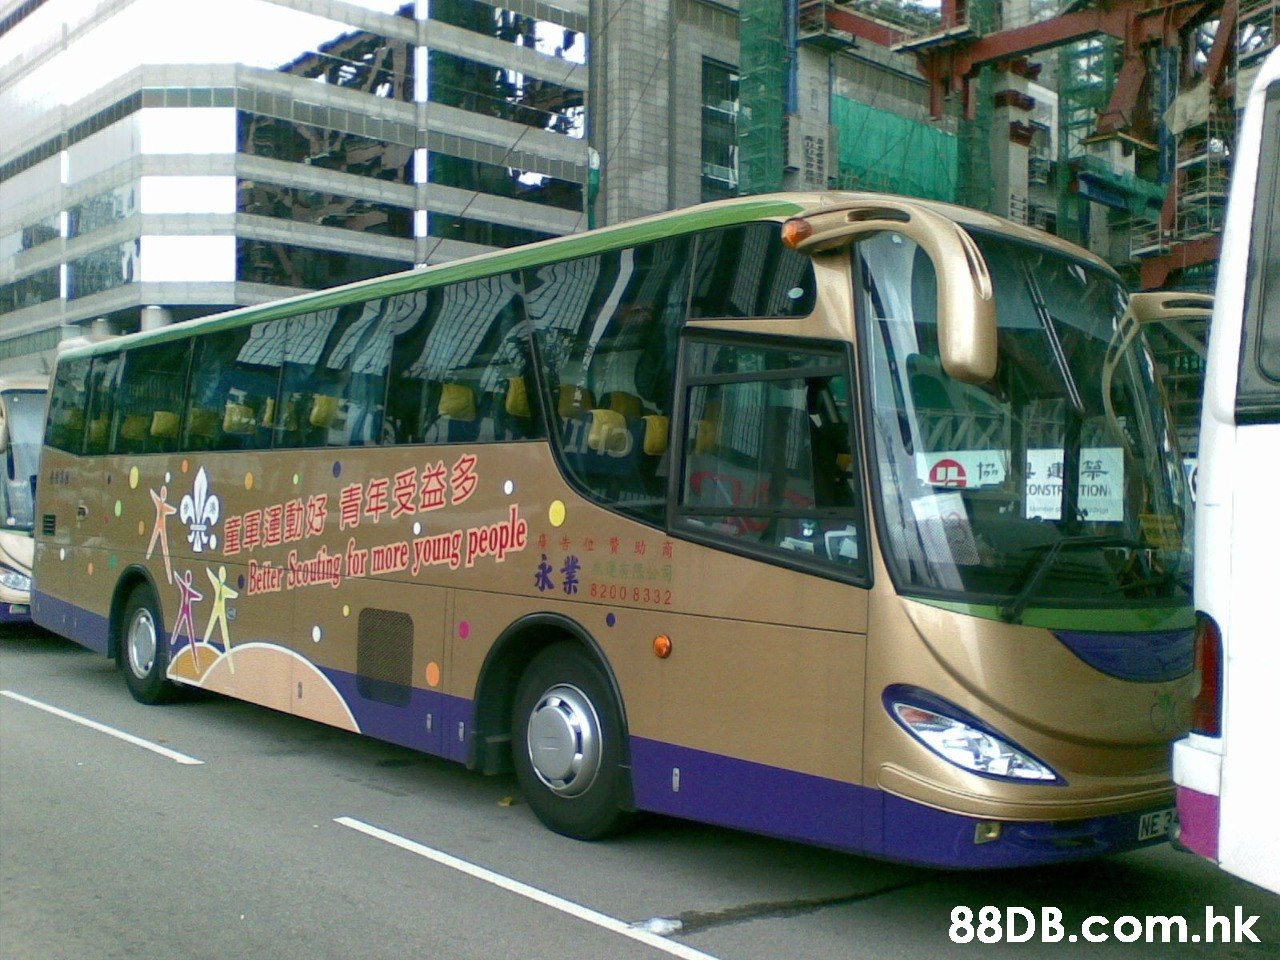 TIB Ala 國動好 青年受益多 Bier Souing fr mre joung people A ONSTR TION 告位費助商 永業 DeLLer 8200 8332 .hk  Land vehicle,Bus,Transport,Vehicle,Mode of transport